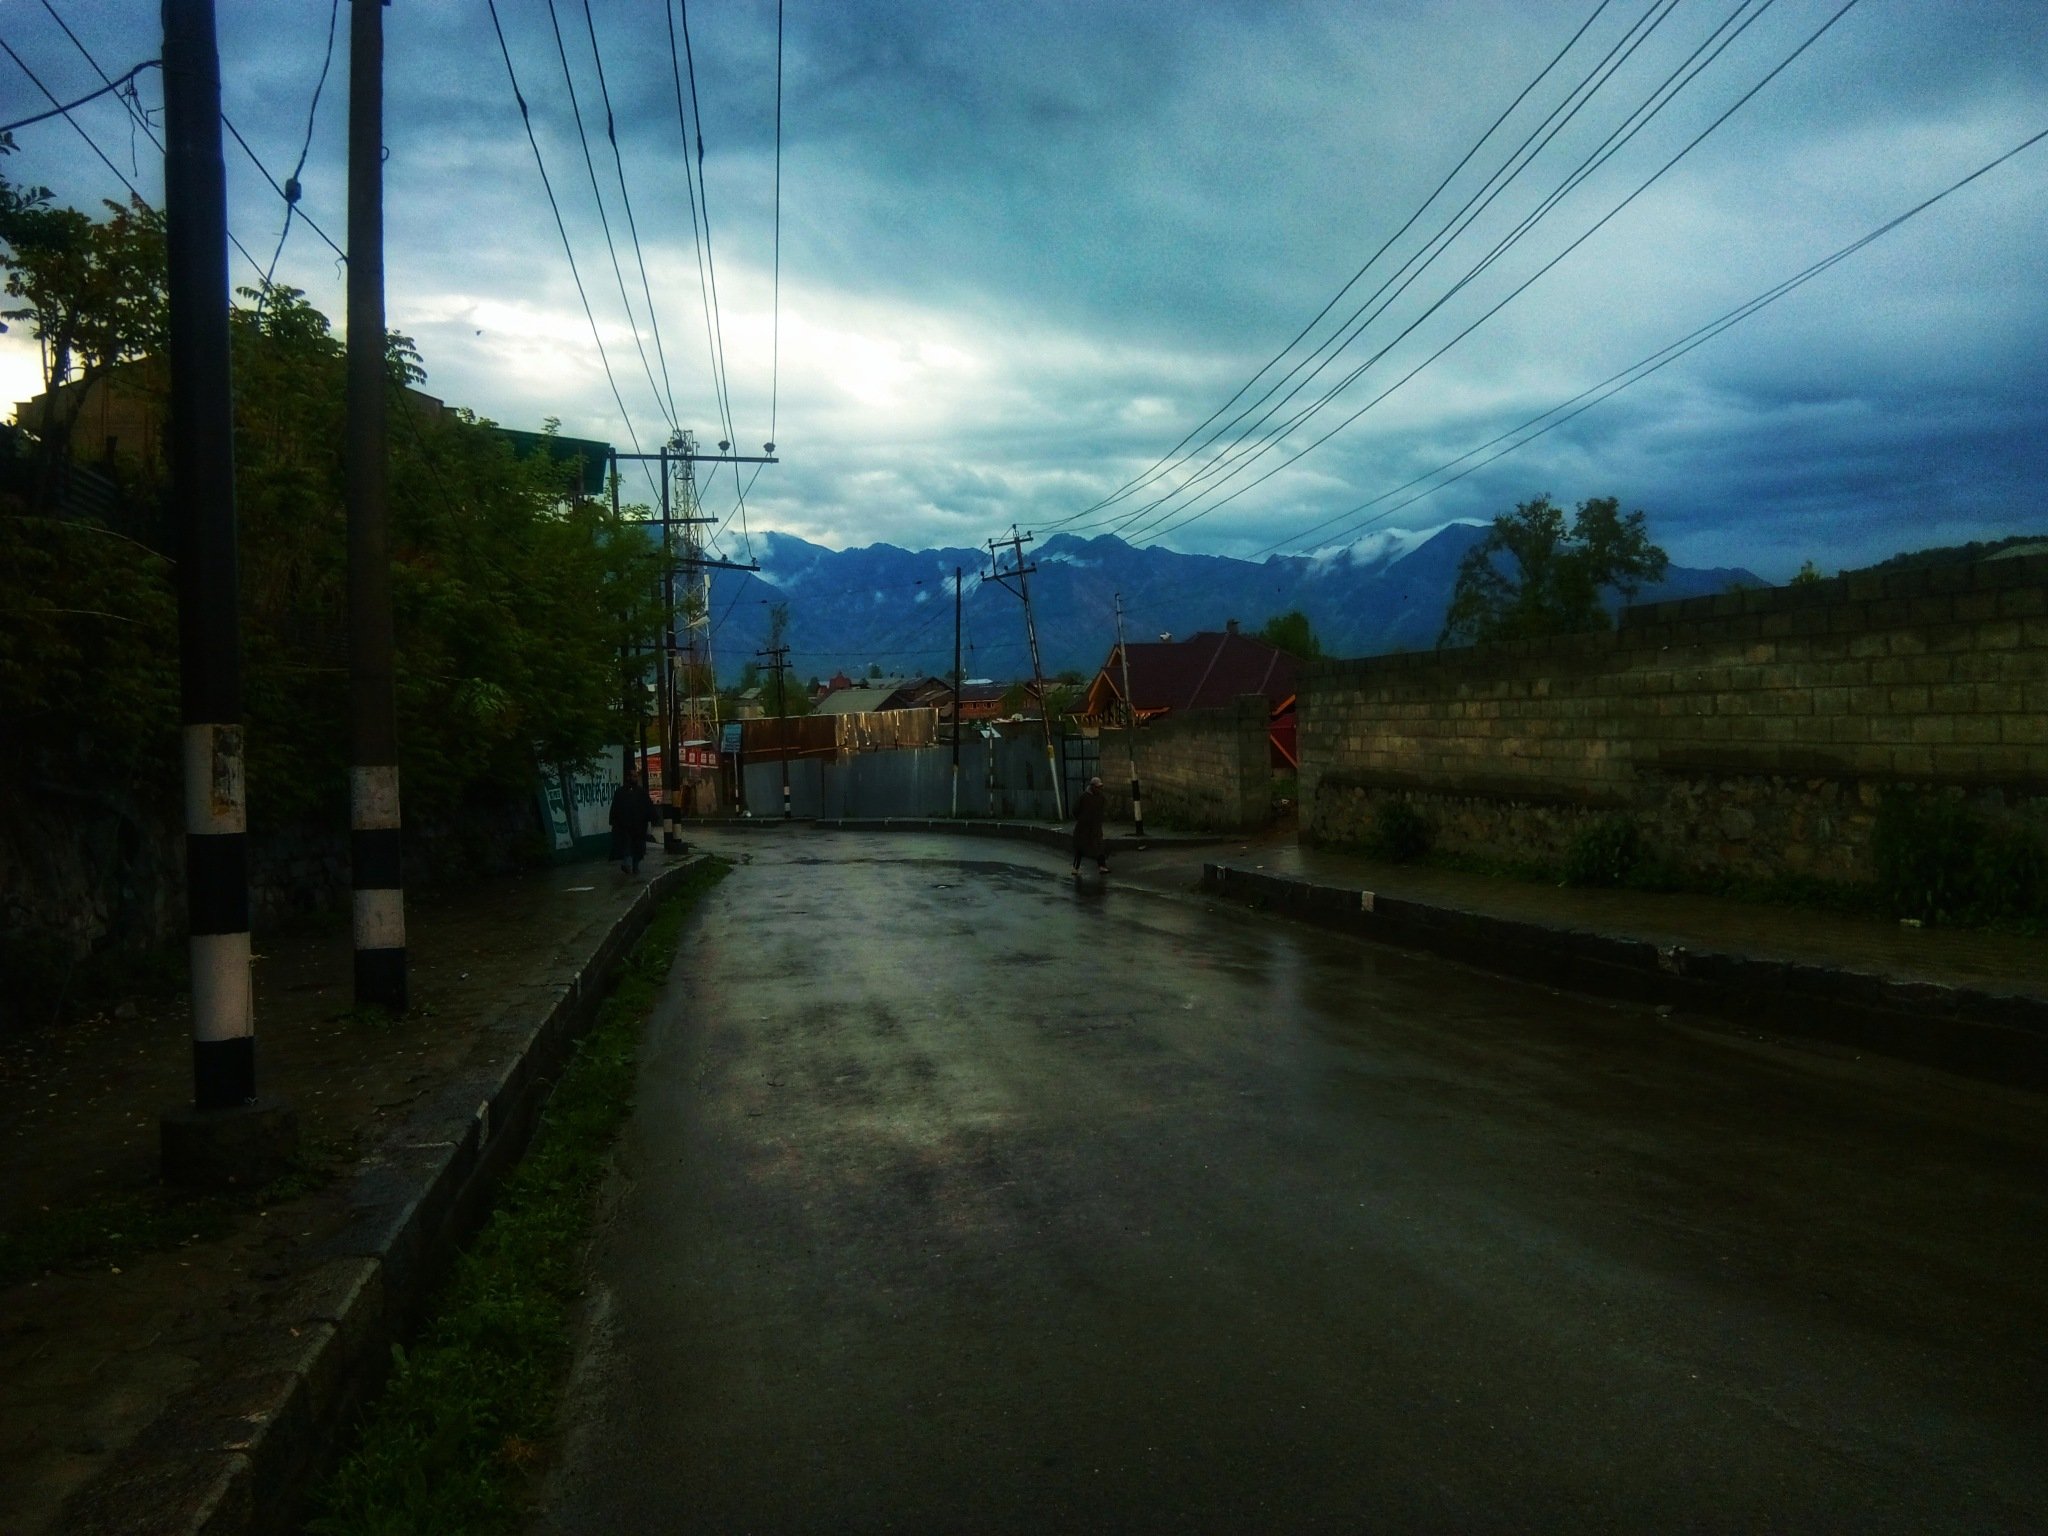 Street by rizvi_captures